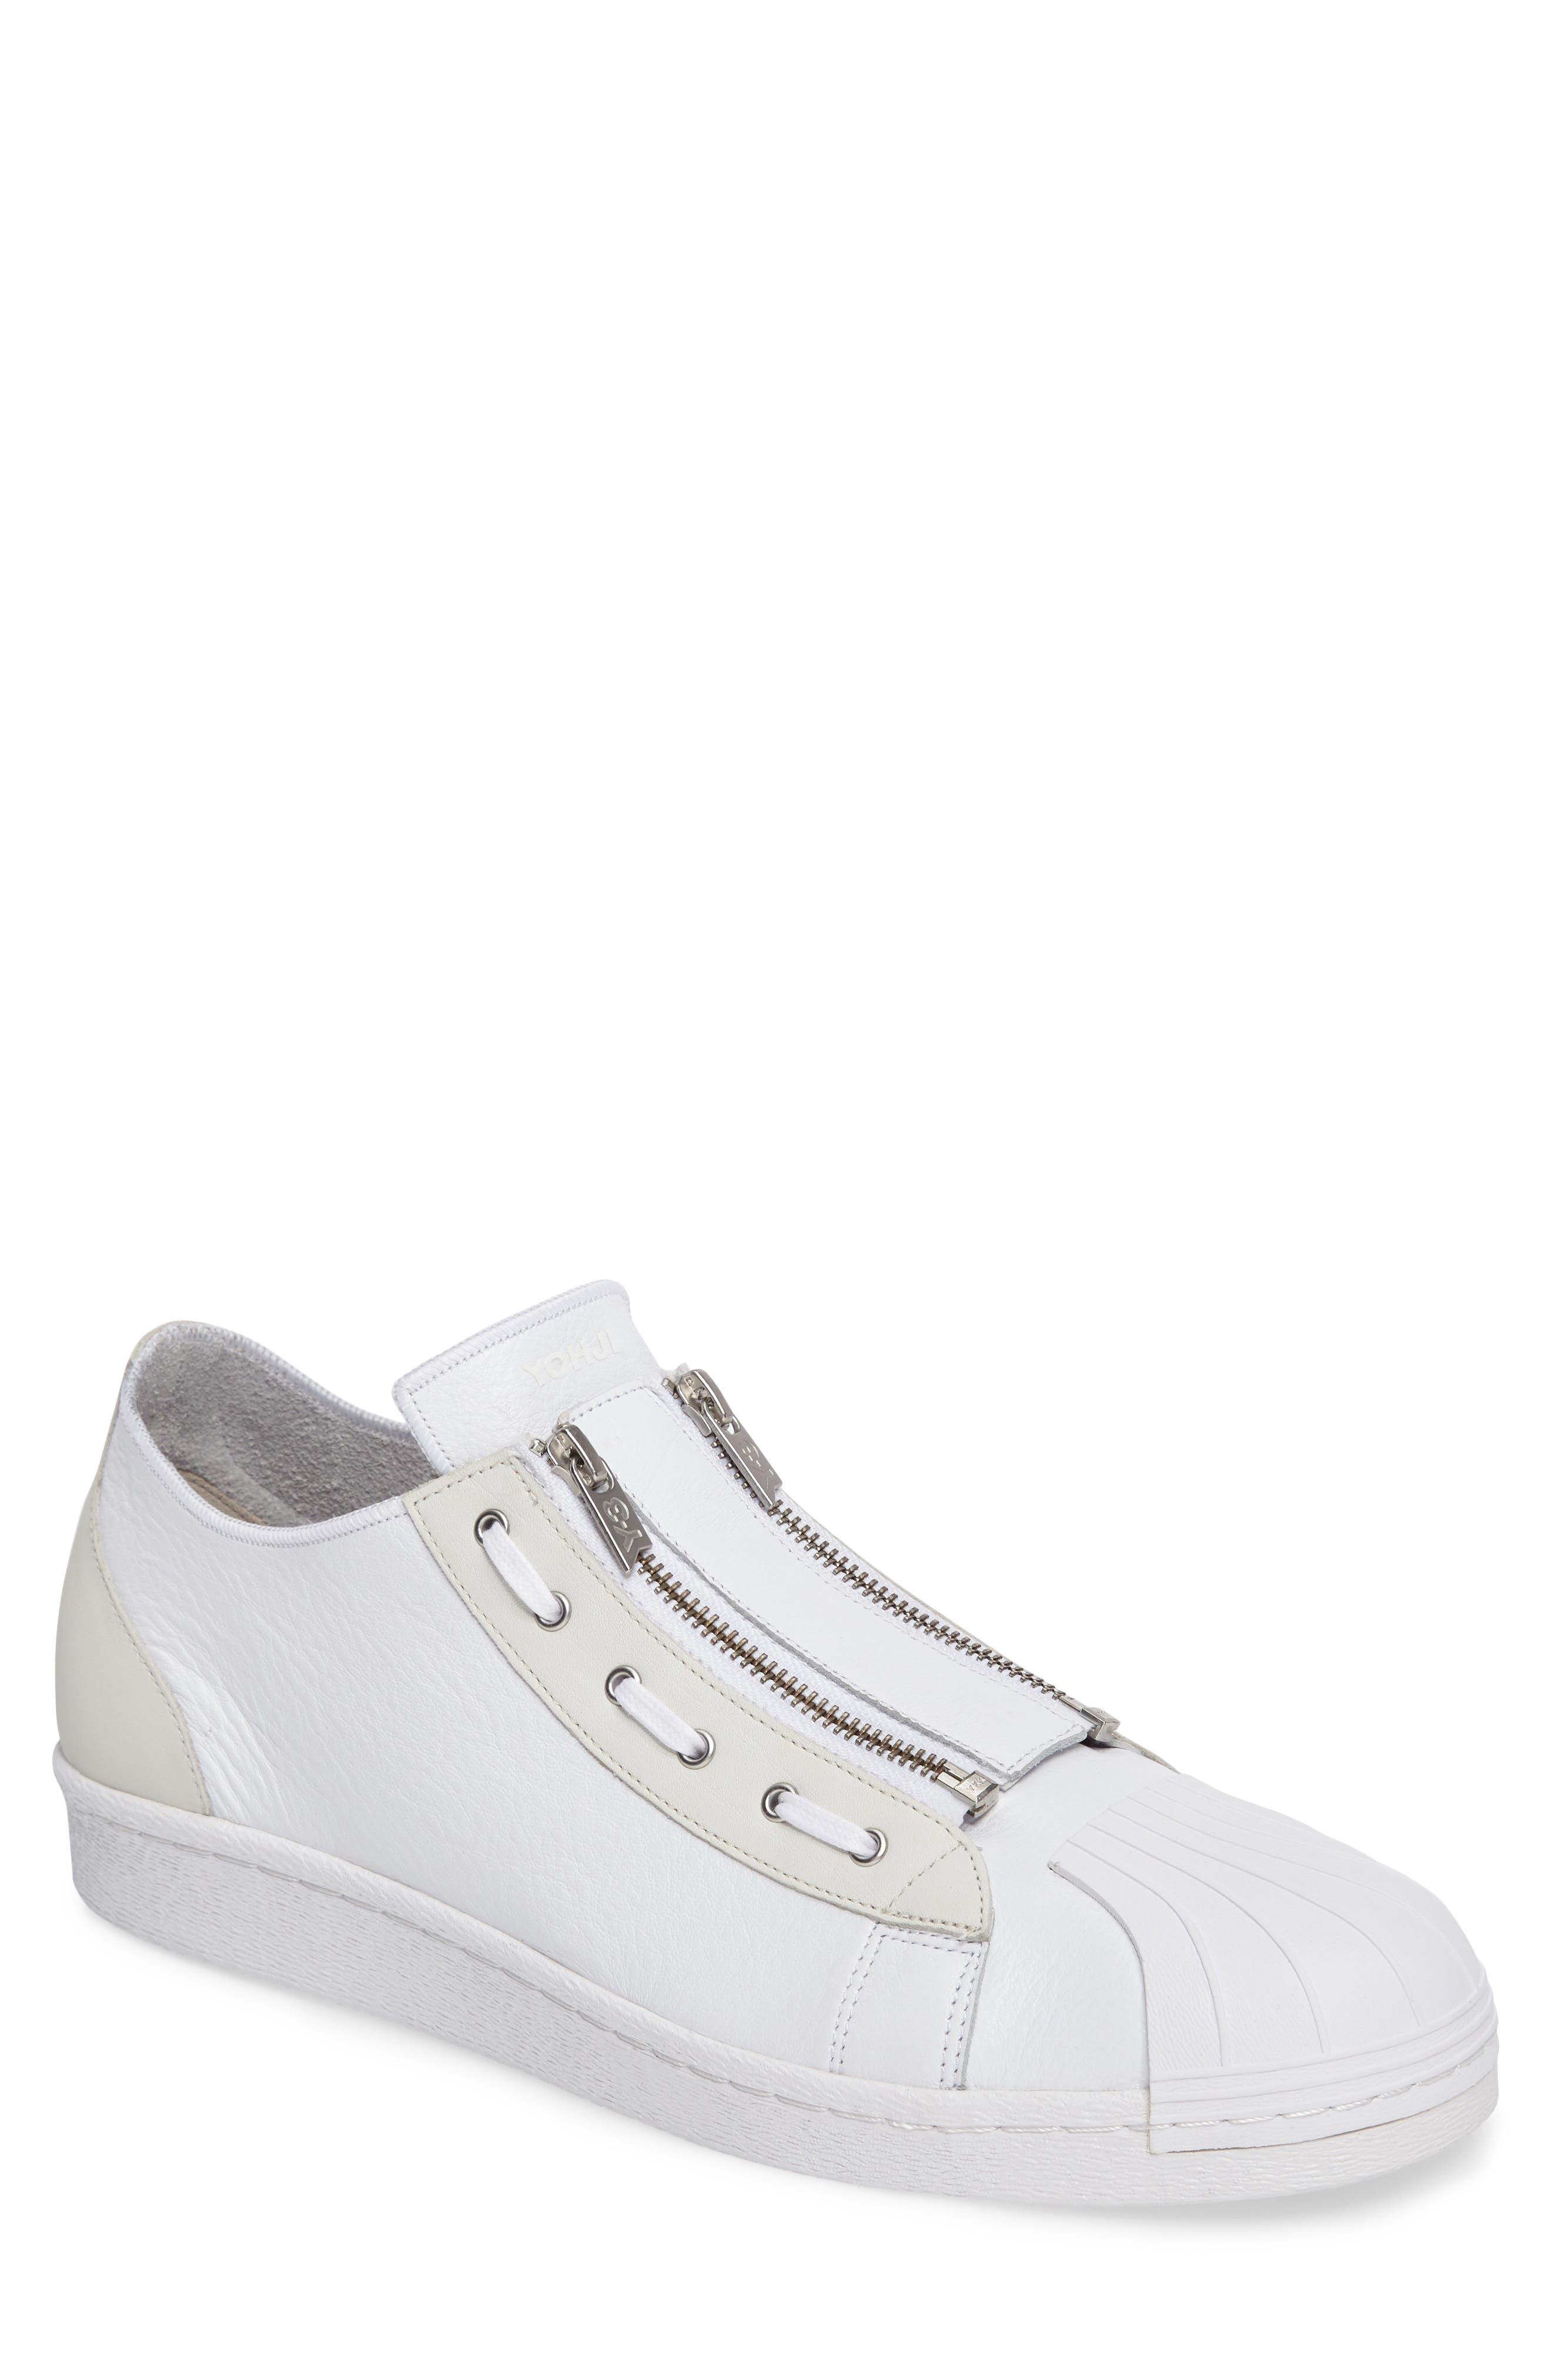 Y-3 'Super' Sneaker (Men)